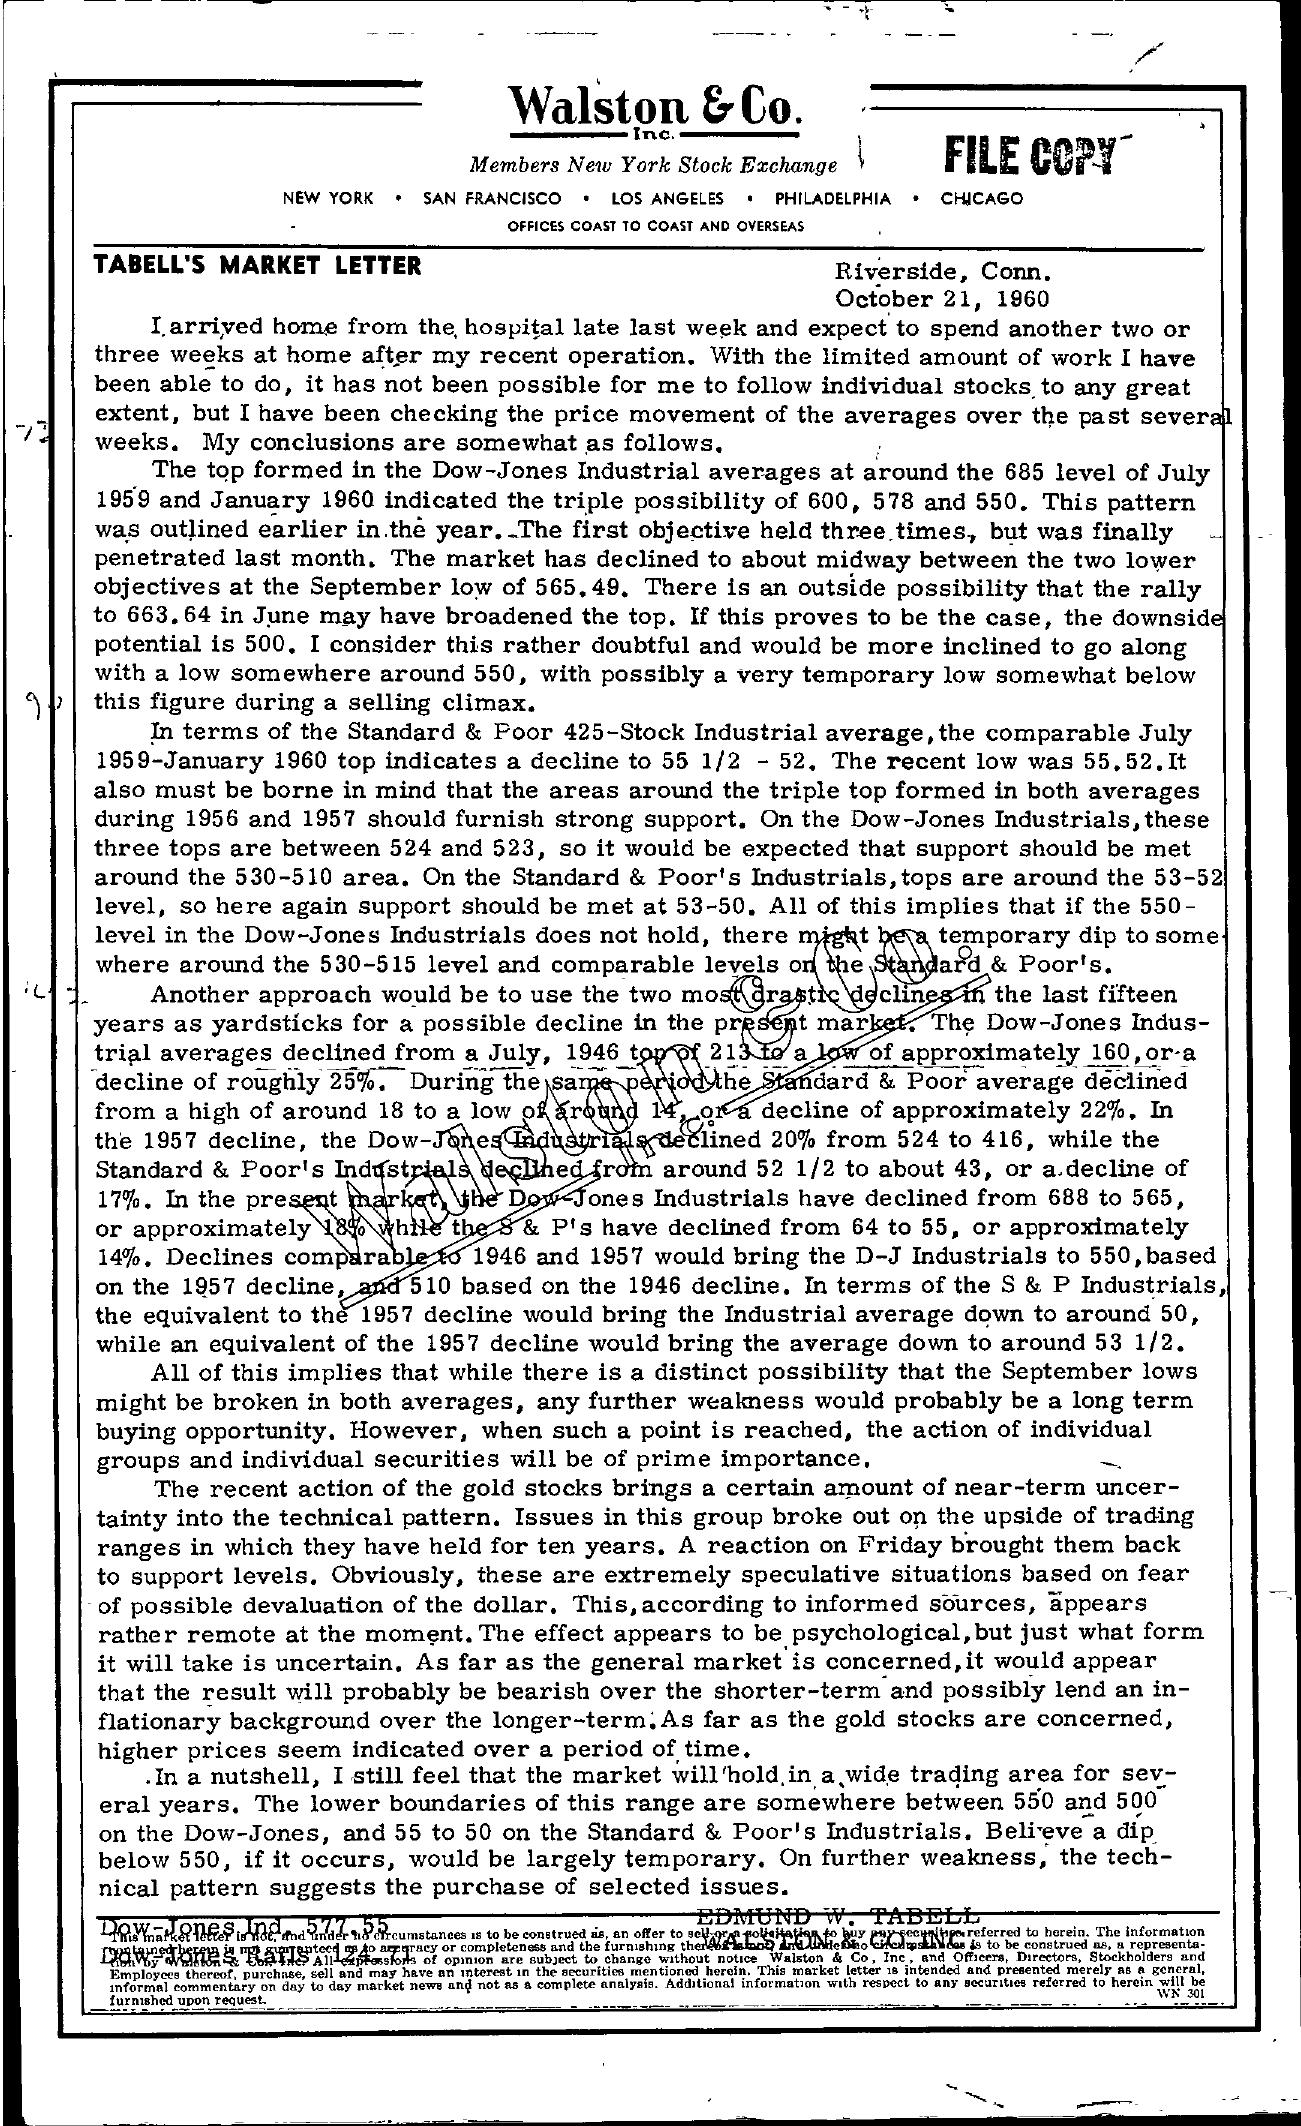 Tabell's Market Letter - October 21, 1960